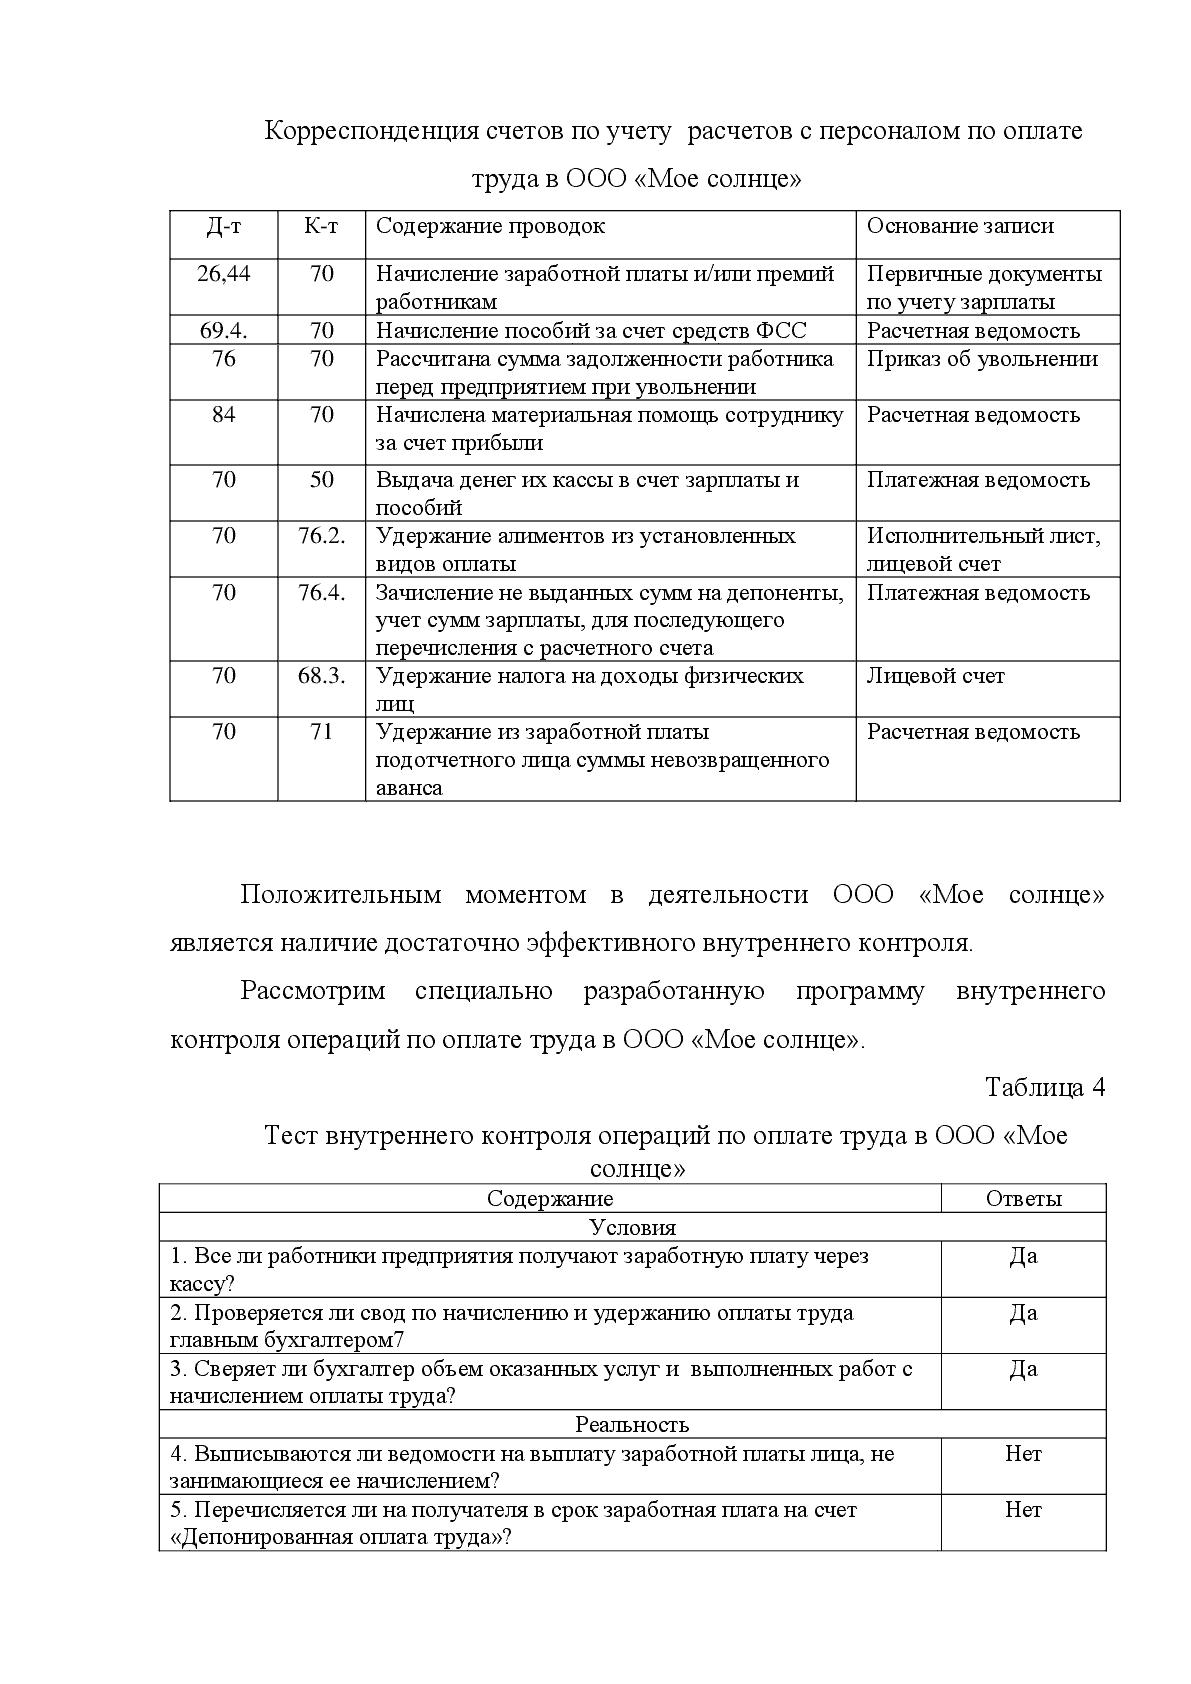 Отчет по практике нпо автоматики 6498